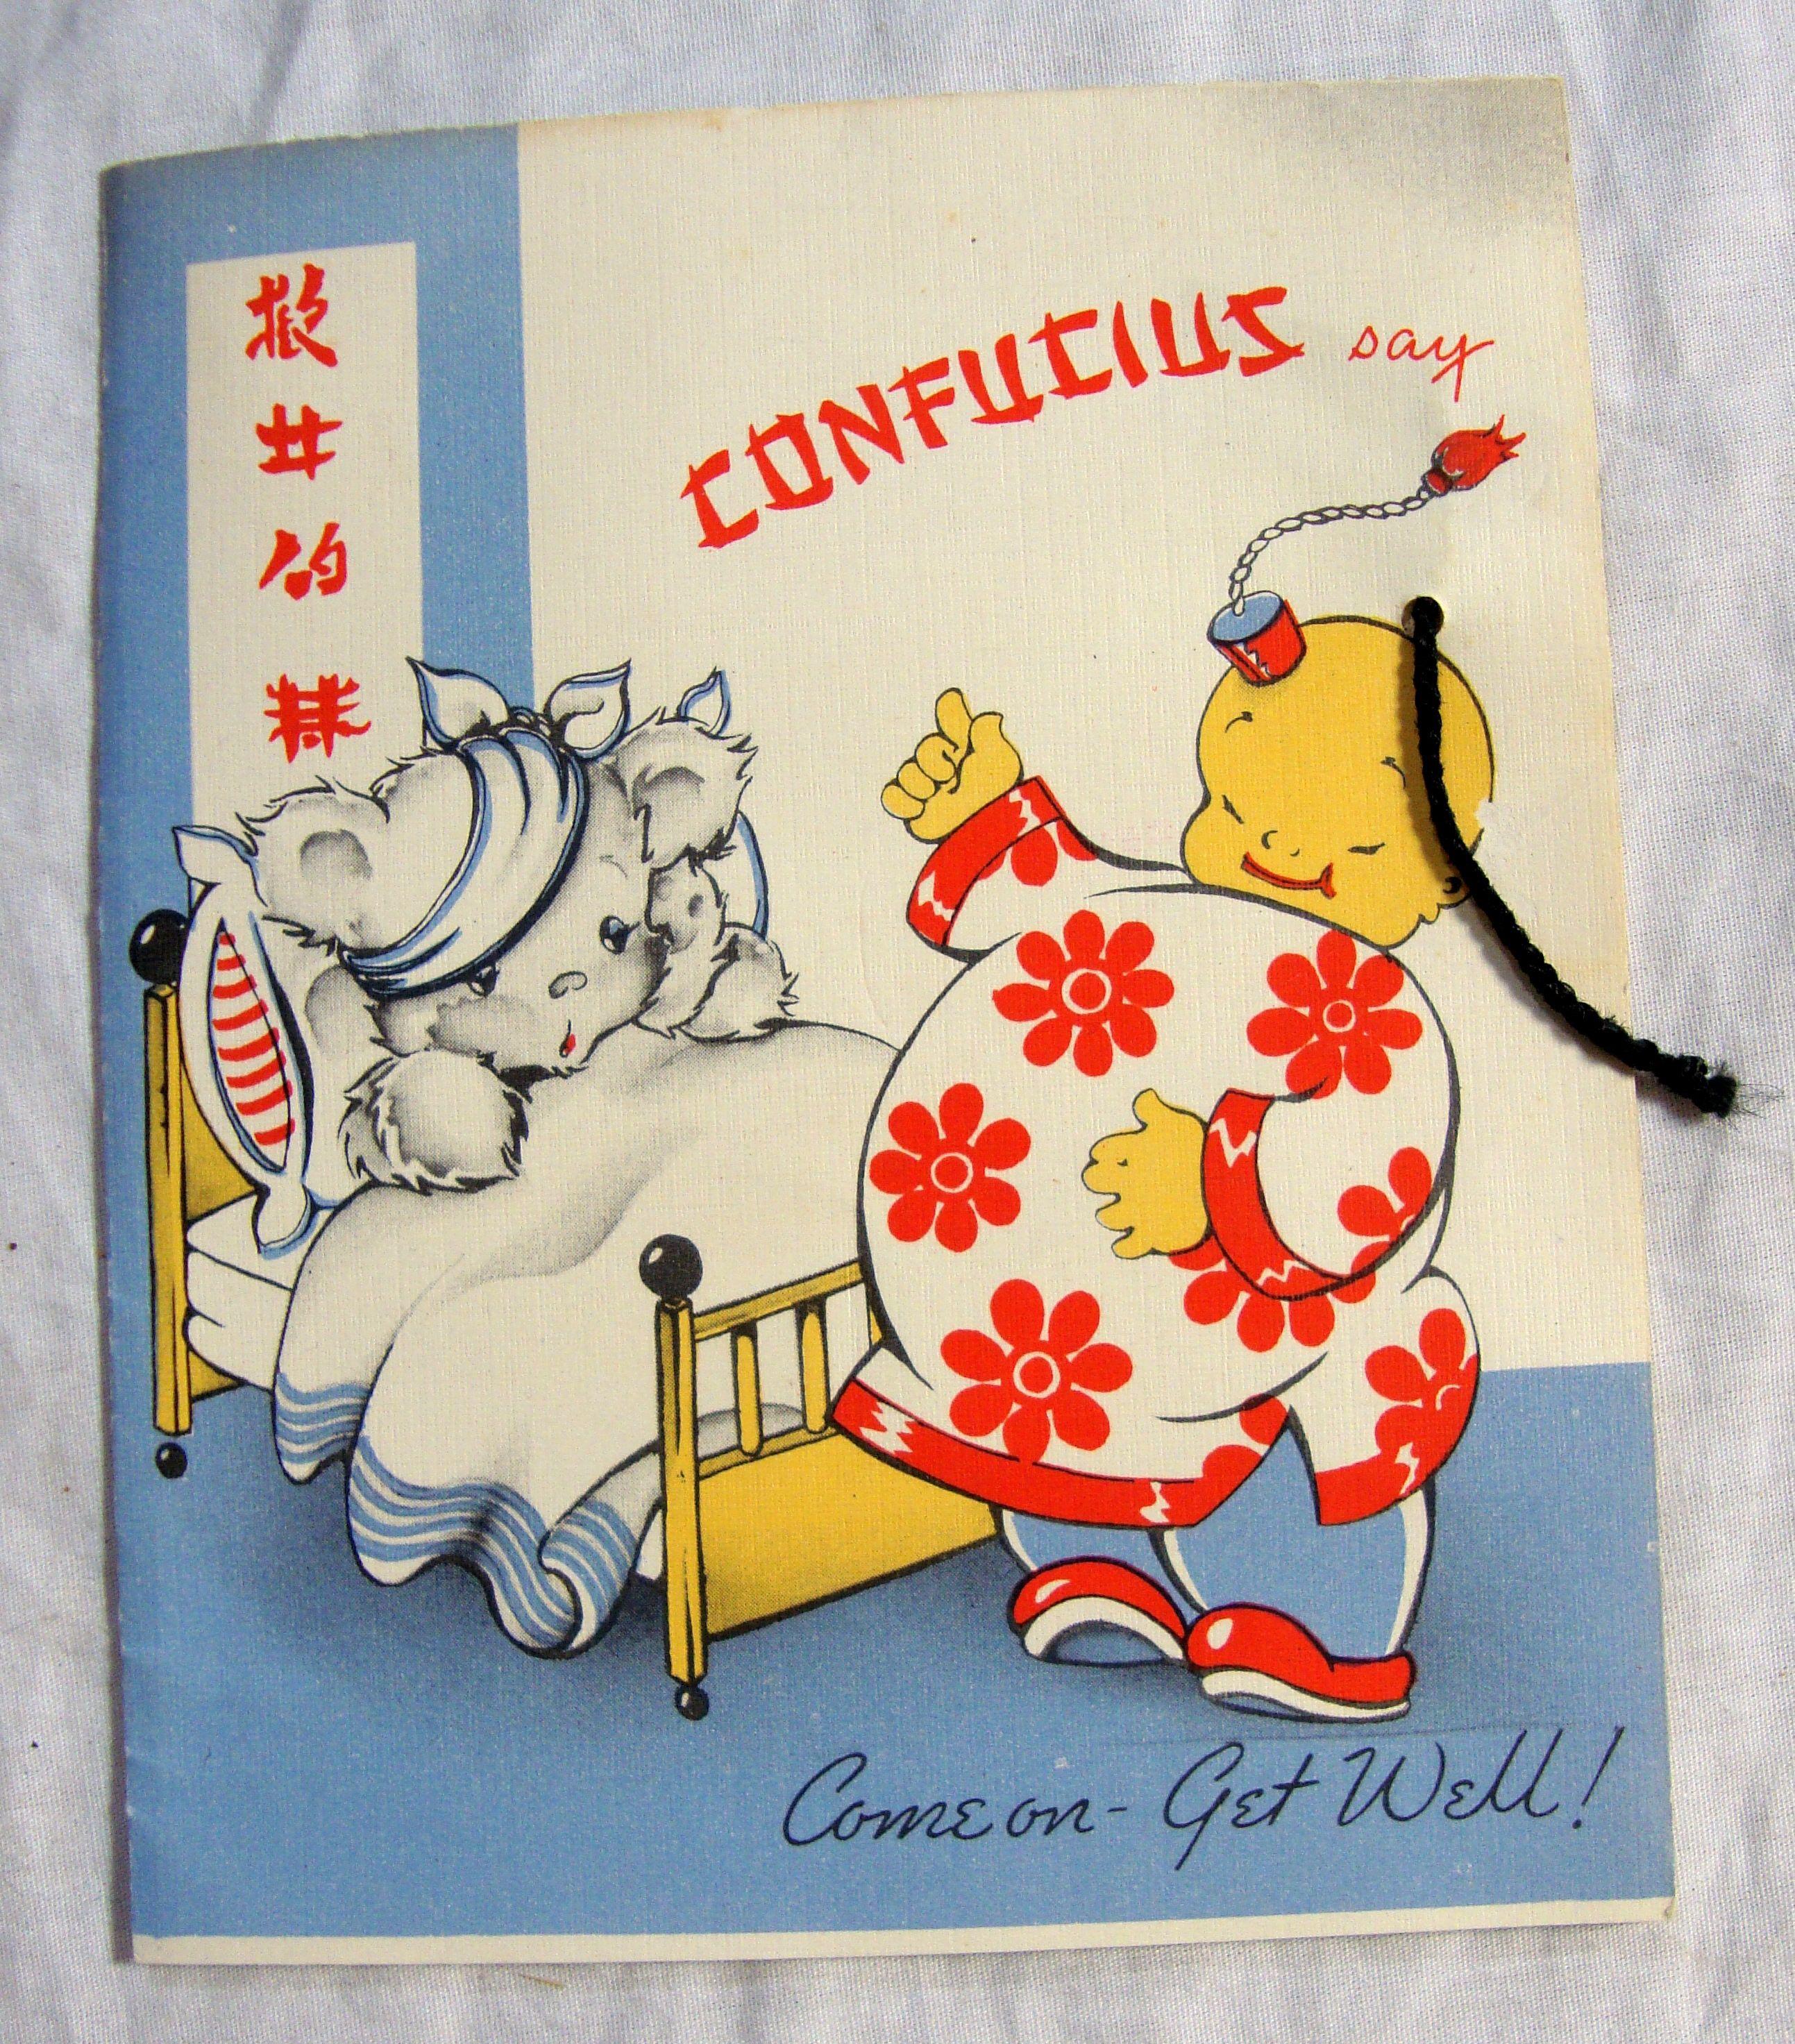 Vintage american greetings confucius say get well chinese bear vintage american greetings confucius say get well chinese bear card kristyandbryce Choice Image